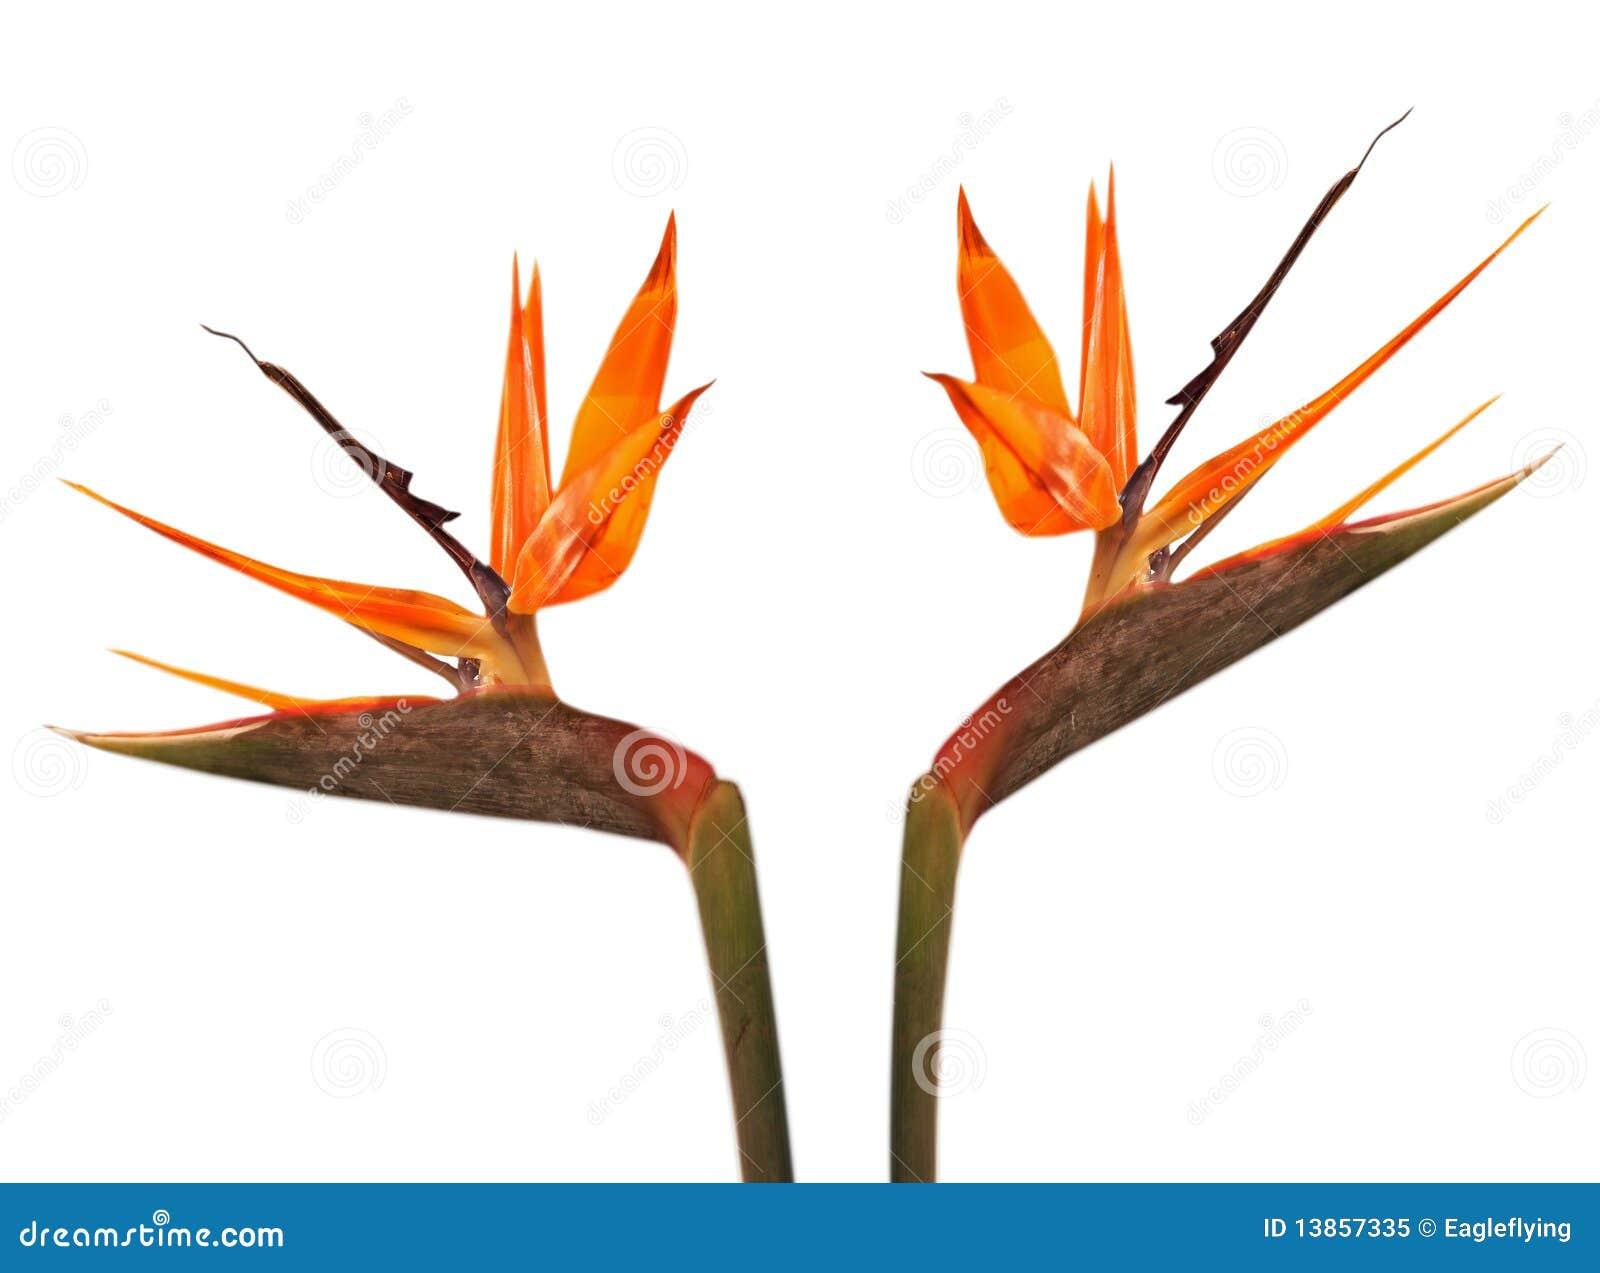 Bird of paradise flower strelitzia stock image image of bird of paradise flower strelitzia over white background mightylinksfo